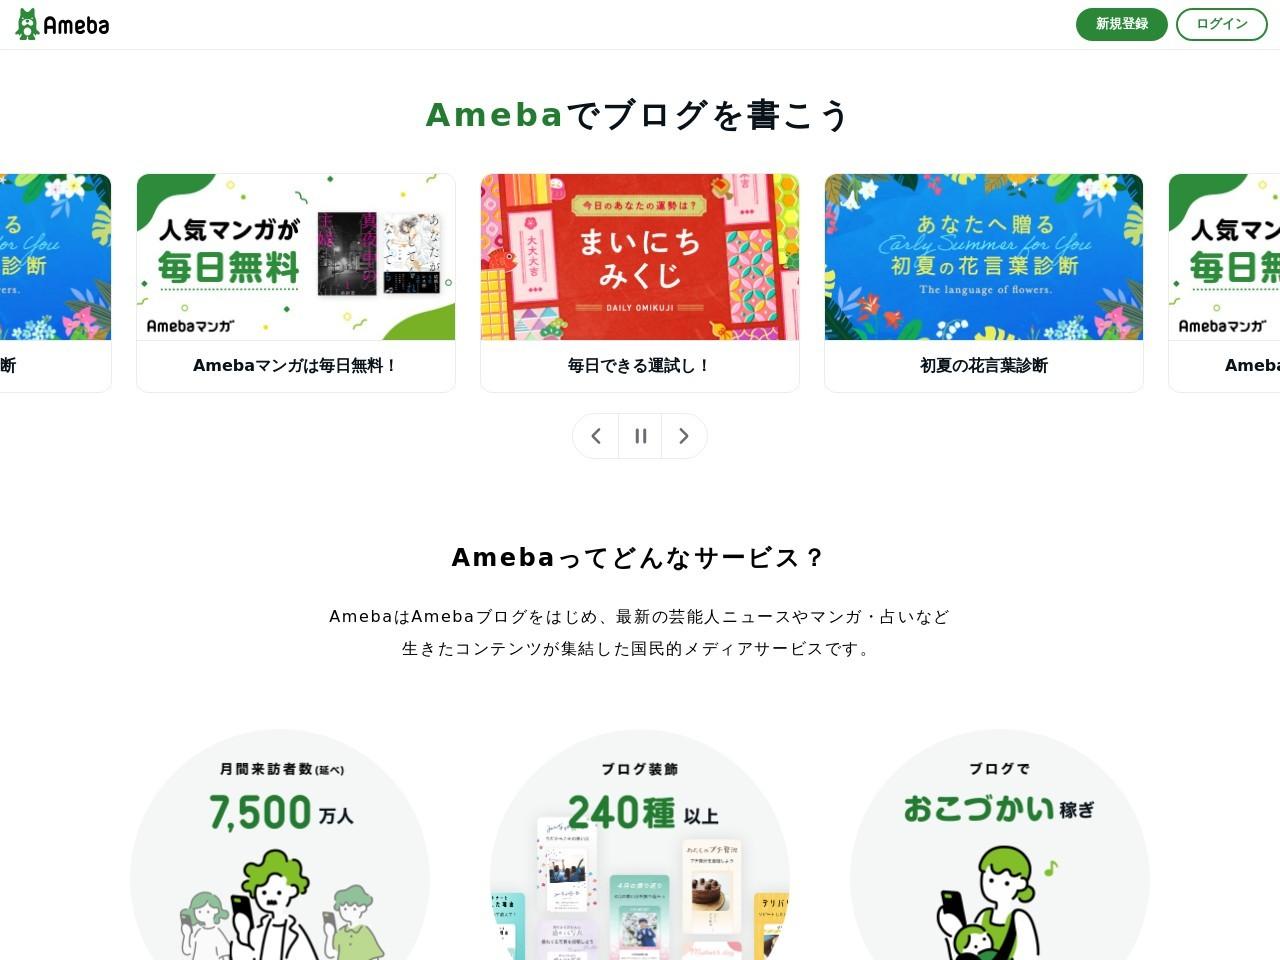 http://ameblo.jp/kyotomumfes/